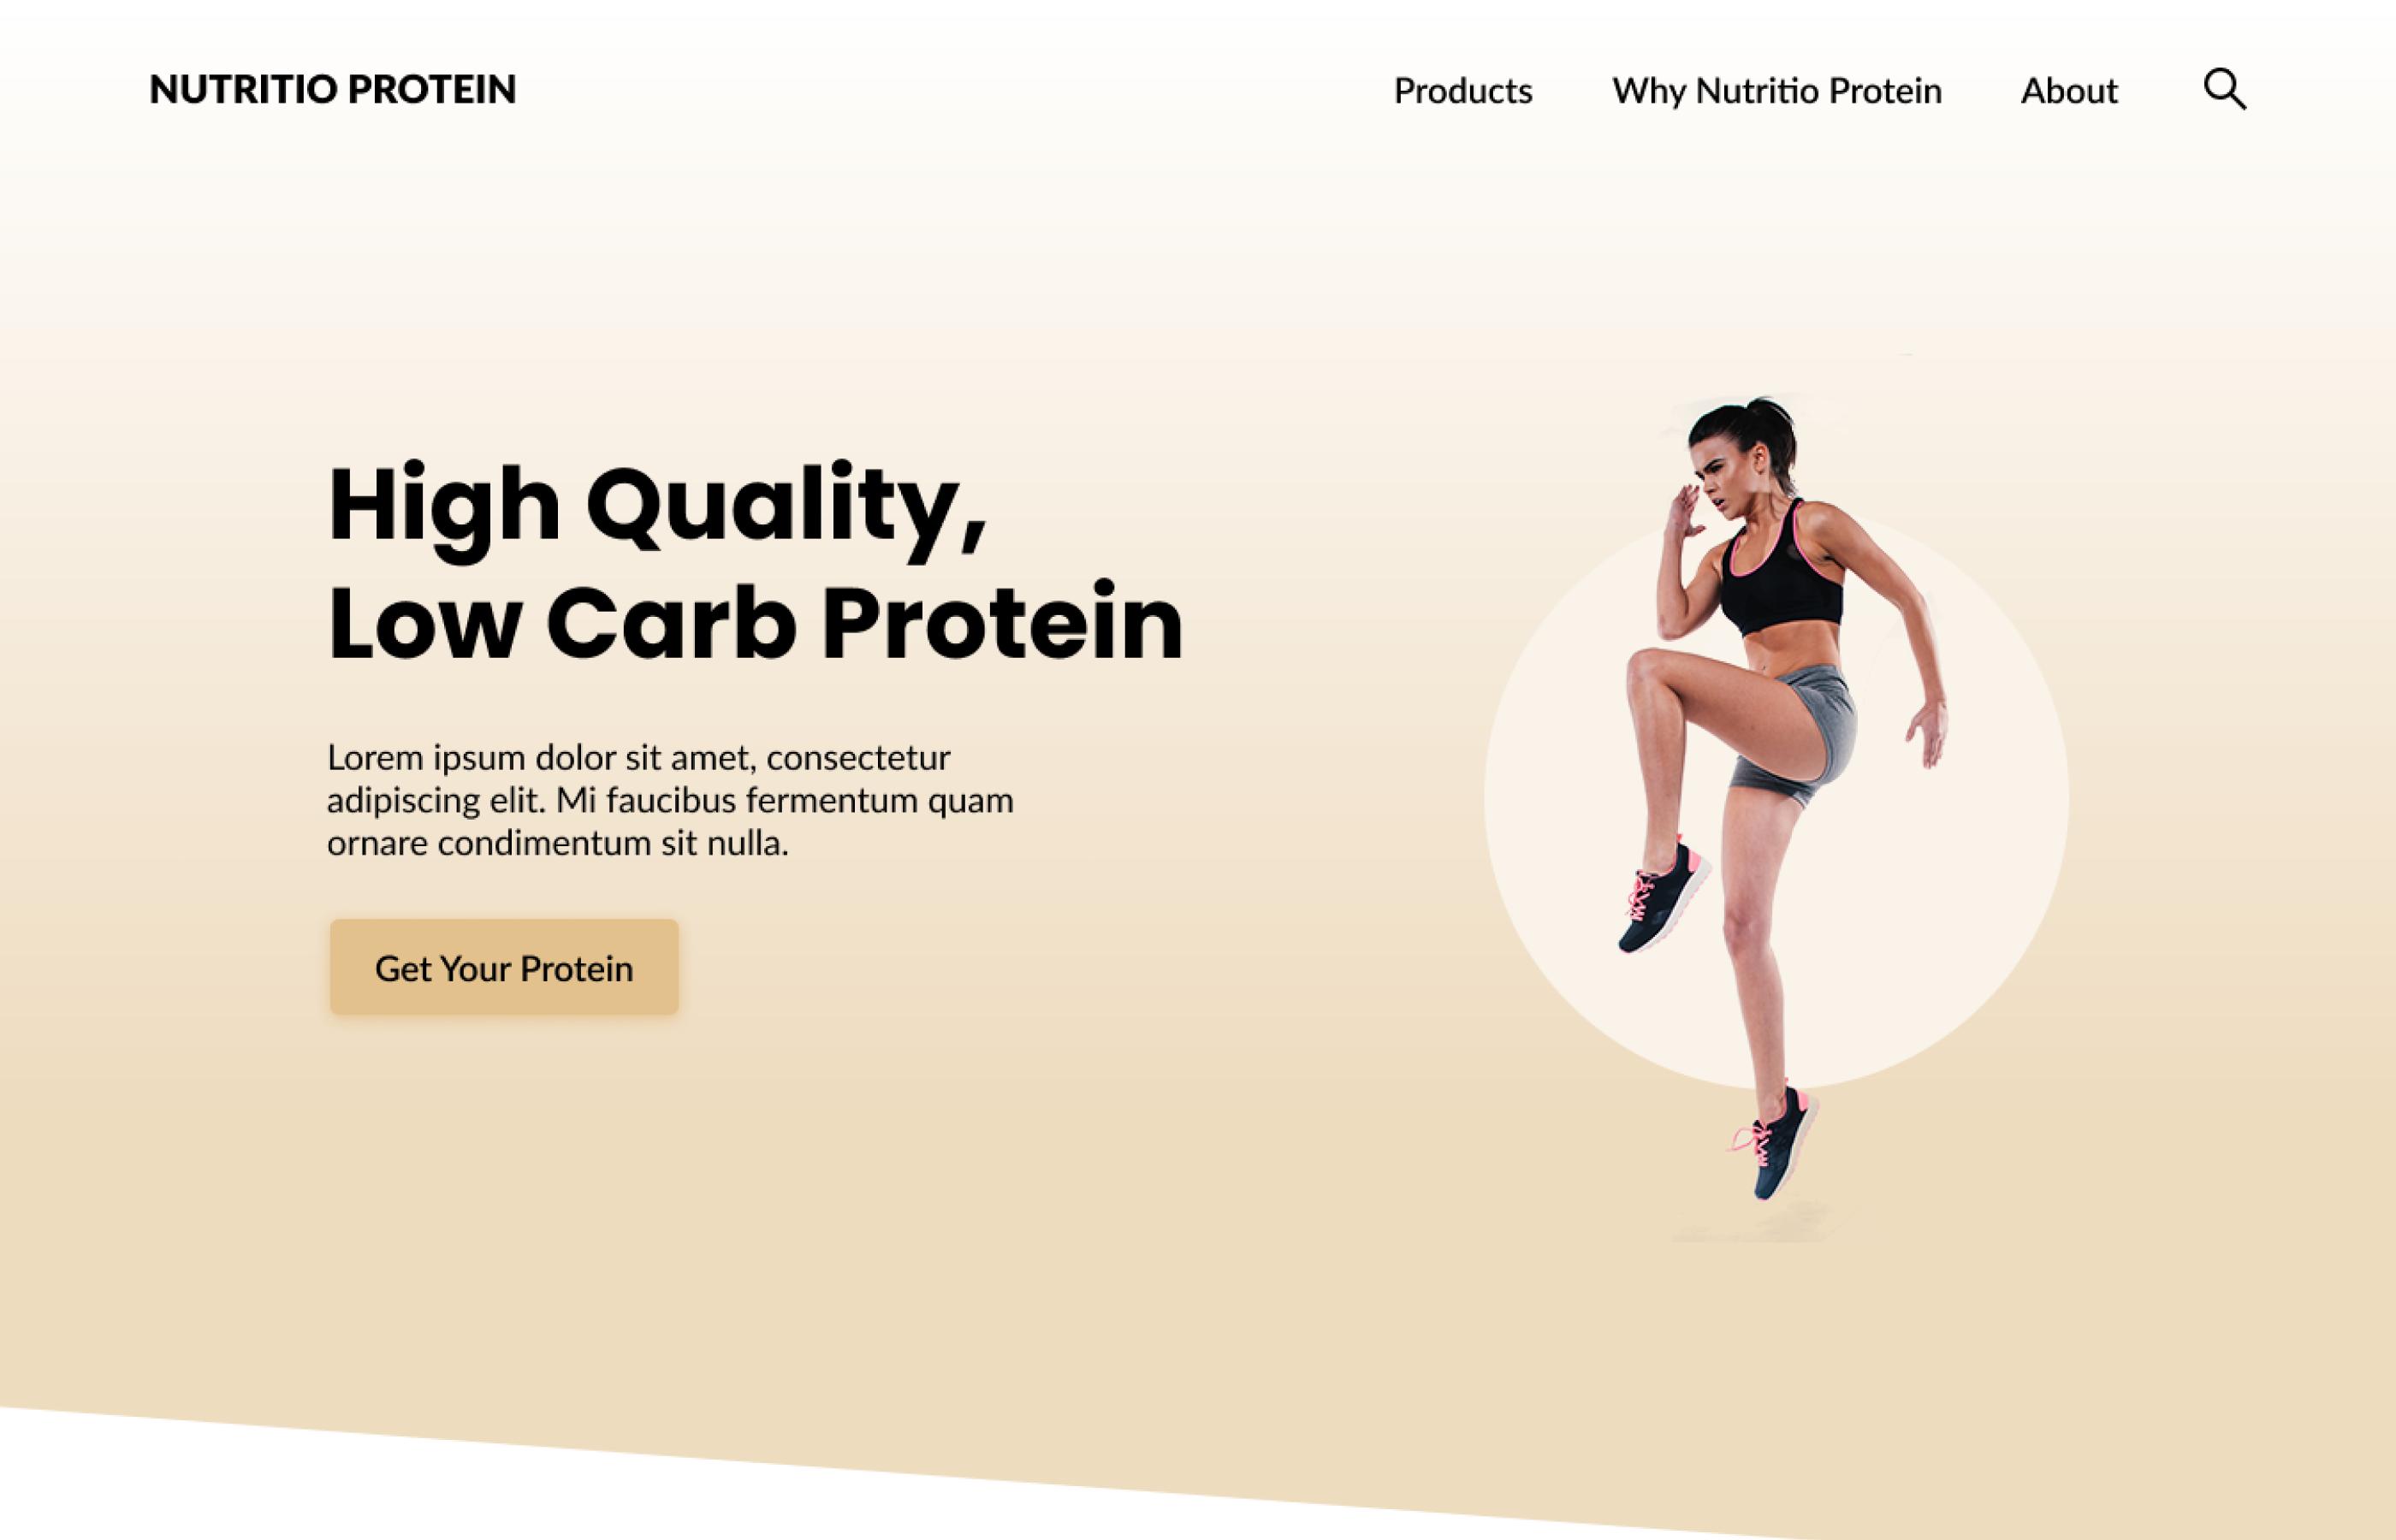 Nutritio Protein by Brett Hudson